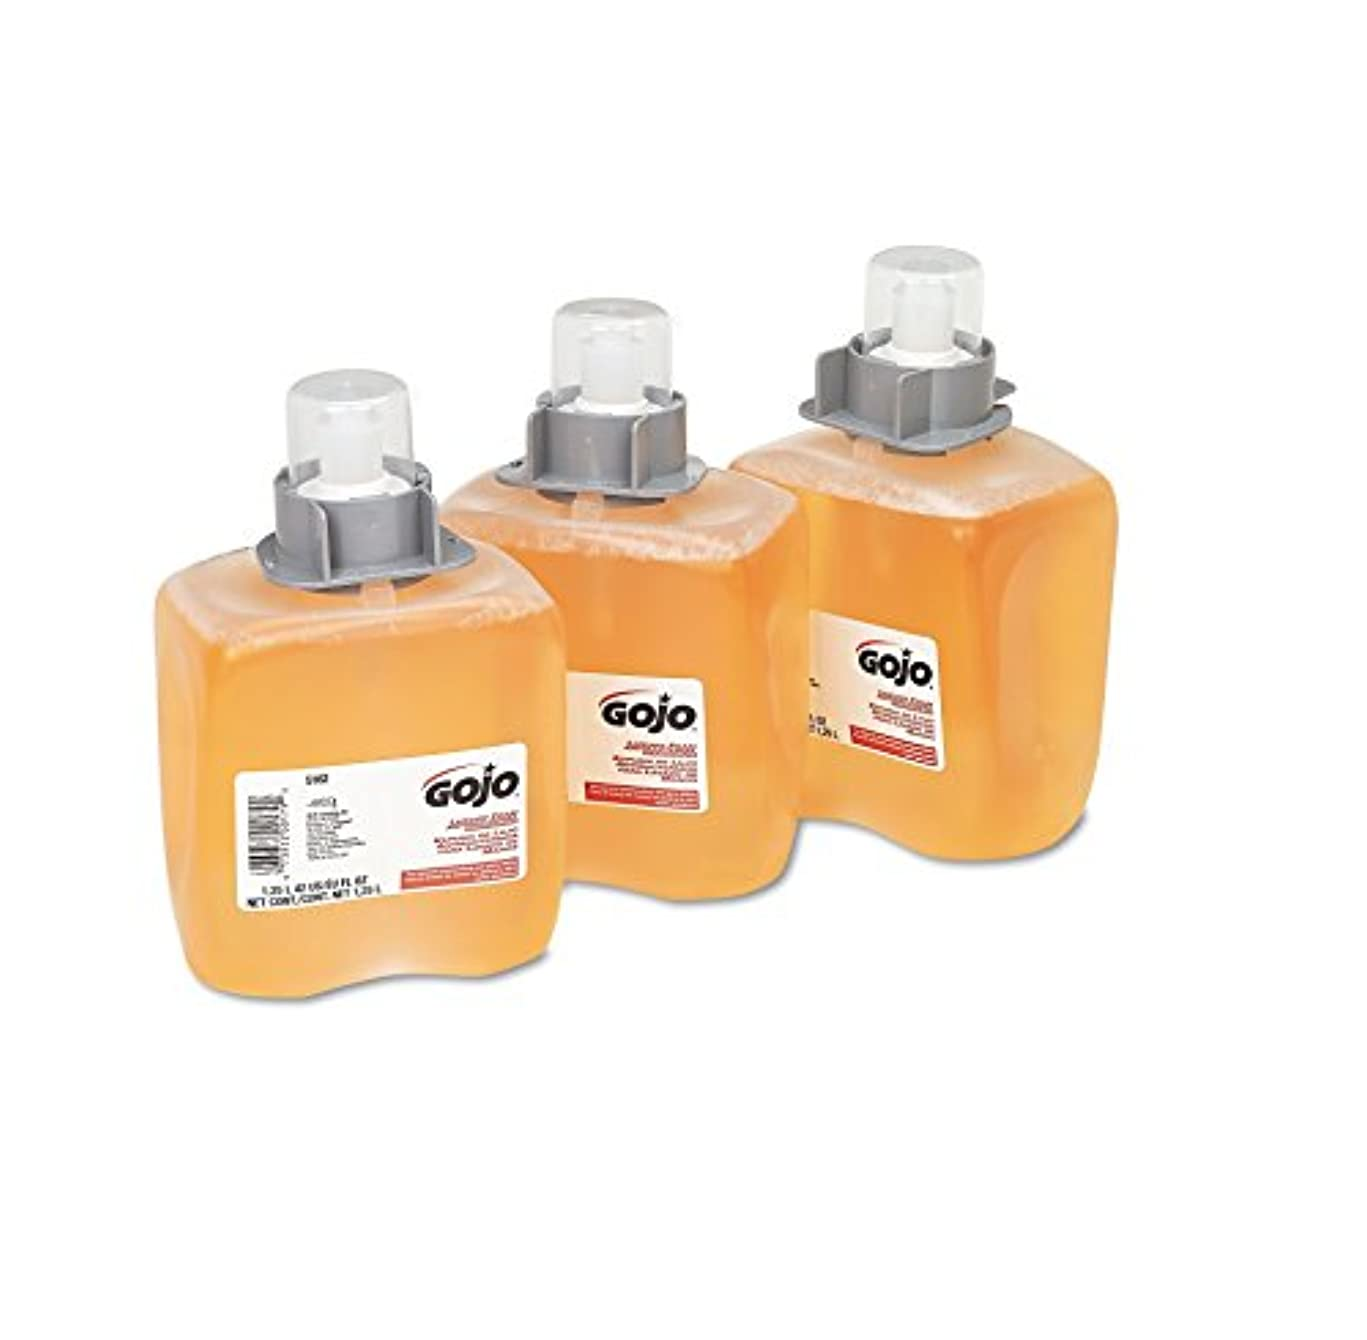 FMX-12 Foam Hand Wash, Orange Blossom, FMX-12 Dispenser, 1250ml Pump, 3/Carton (並行輸入品)